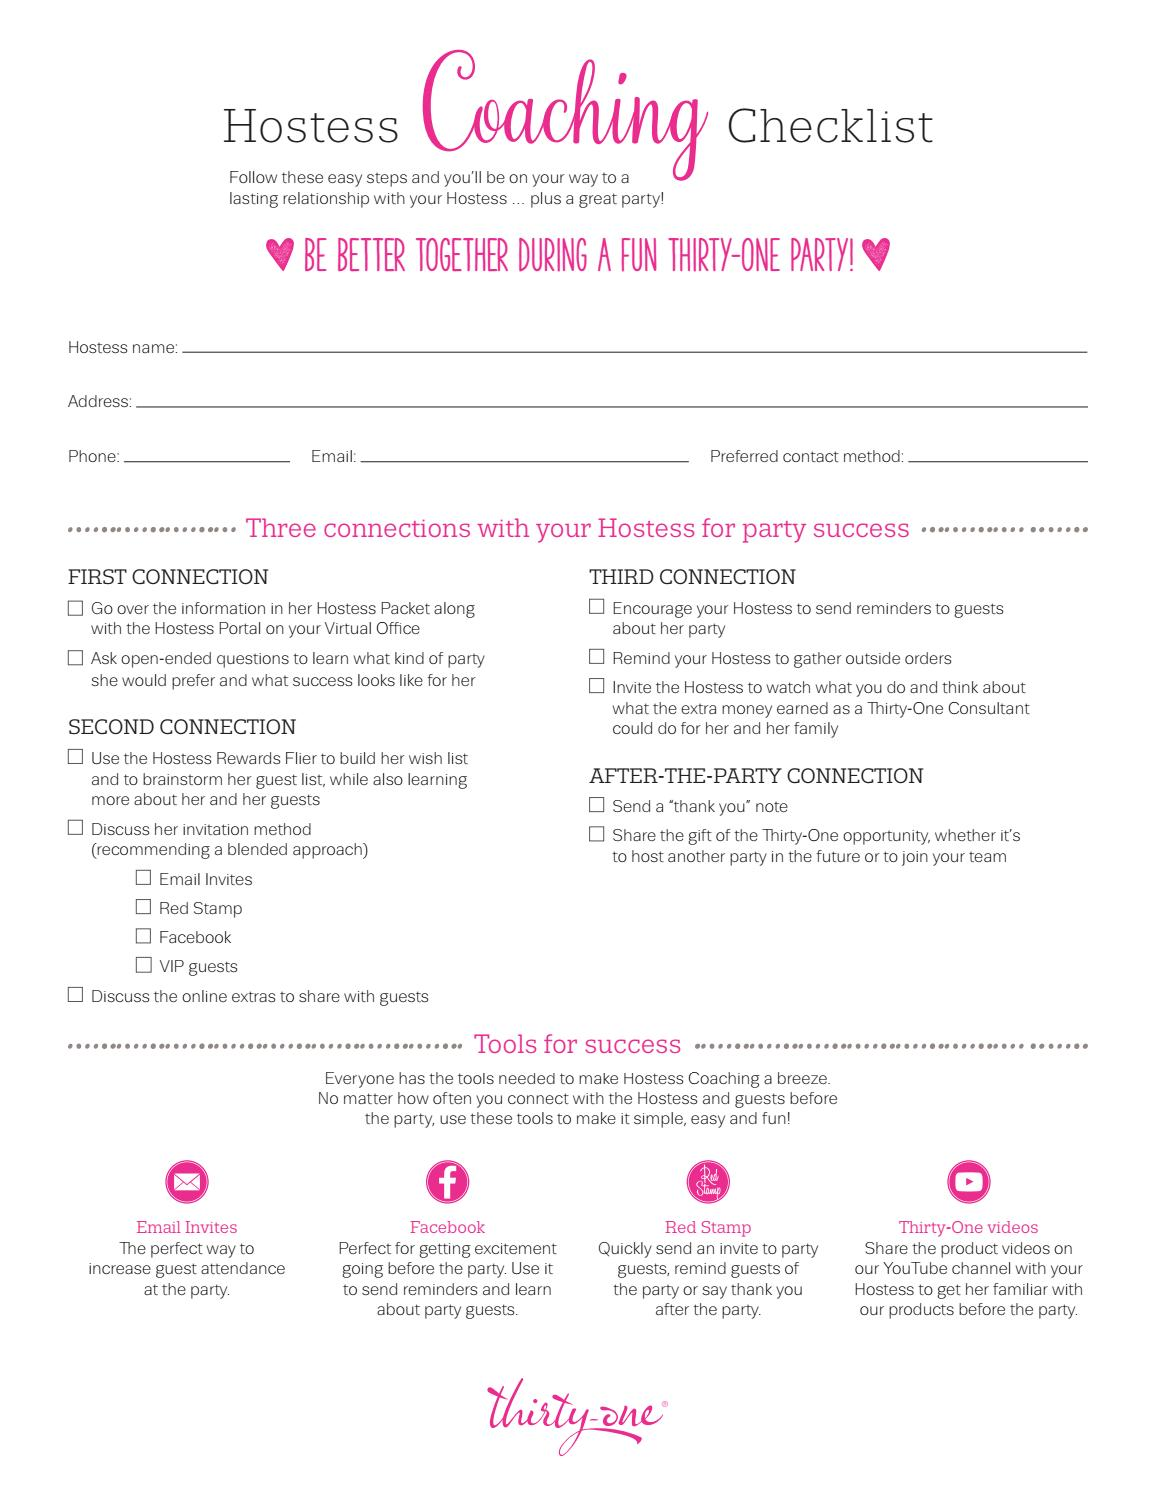 Hostess Coaching Checklist Fall Winter 2016 By Nicolesnyder Issuu